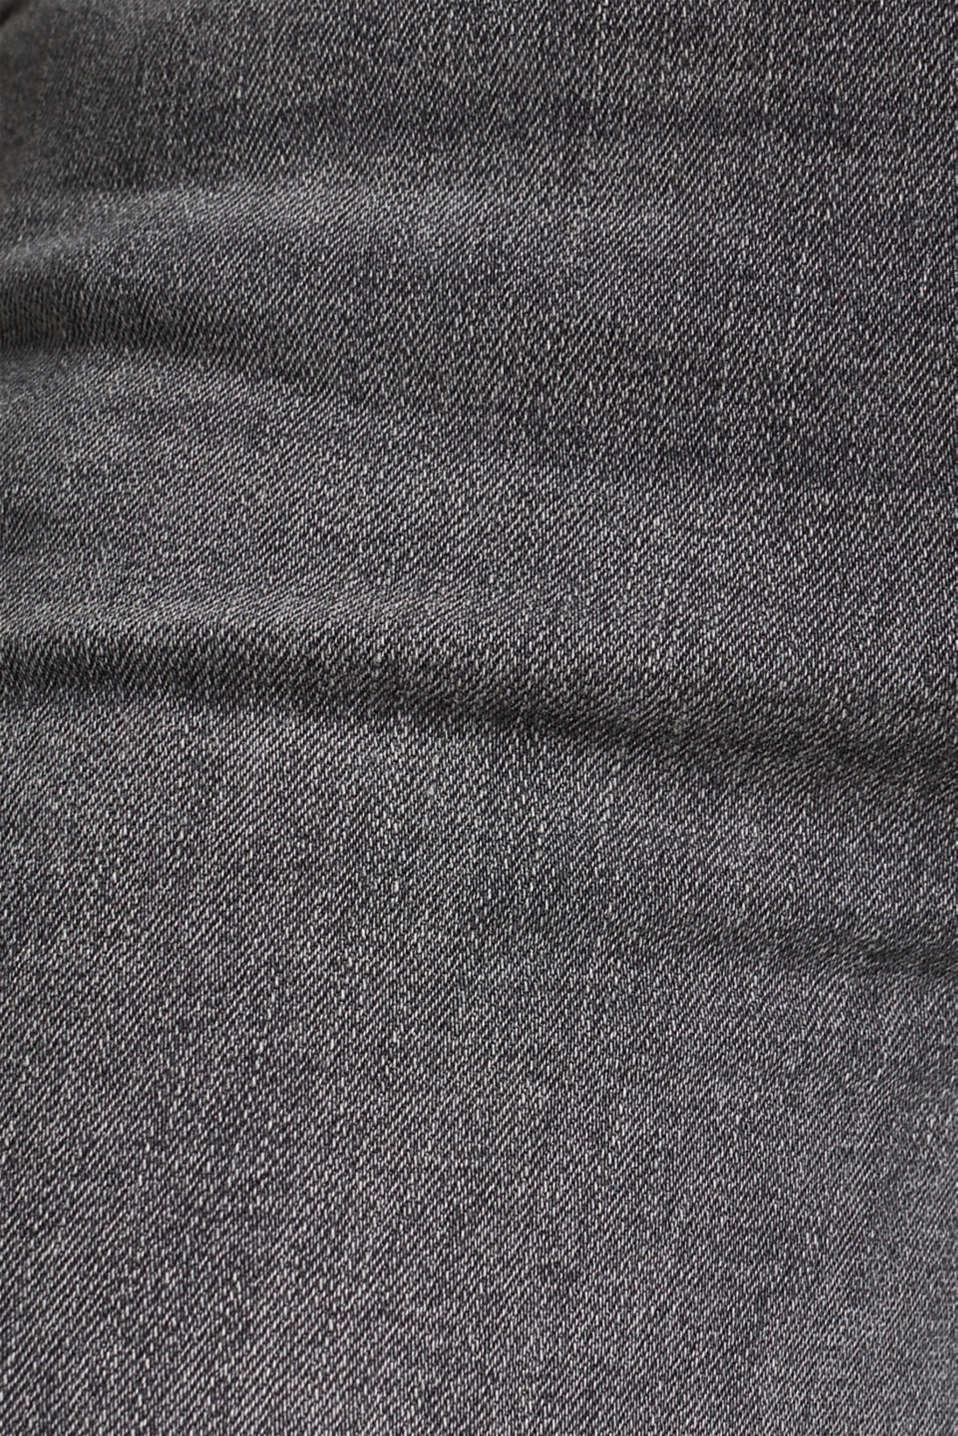 Pants denim, GREY MEDIUM WASH, detail image number 4